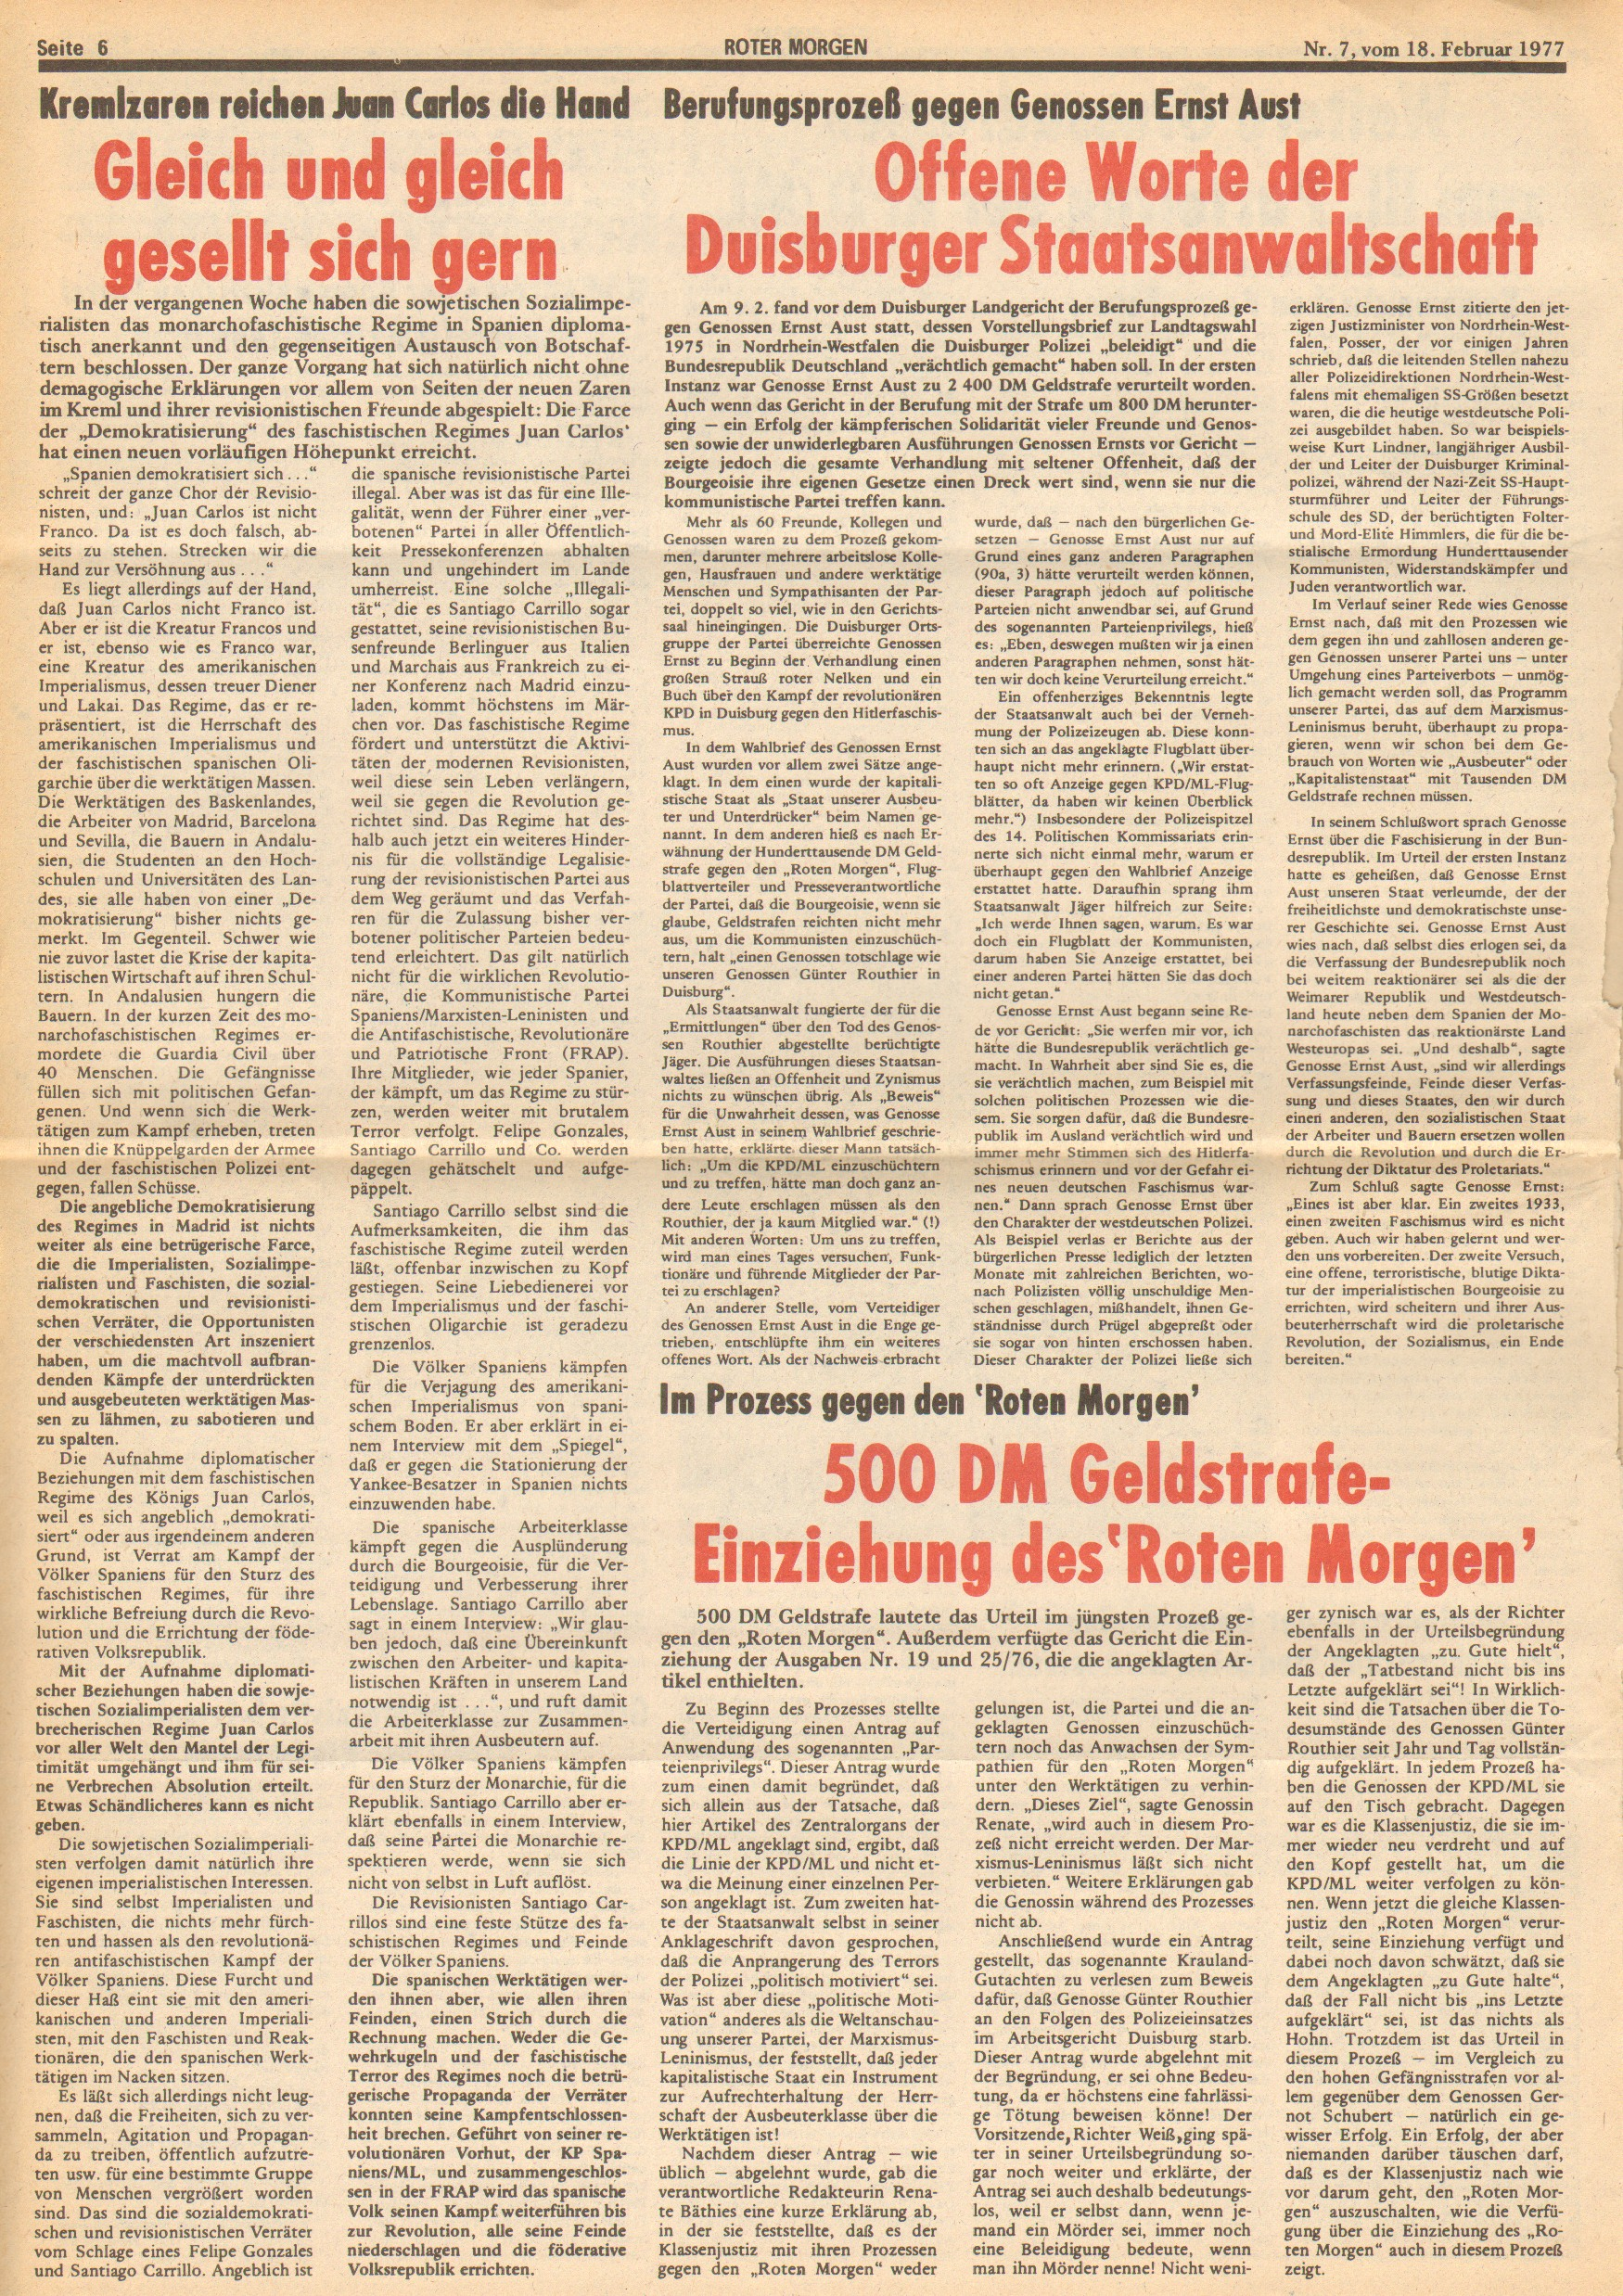 Roter Morgen, 11. Jg., 18. Februar 1977, Nr. 7, Seite 6